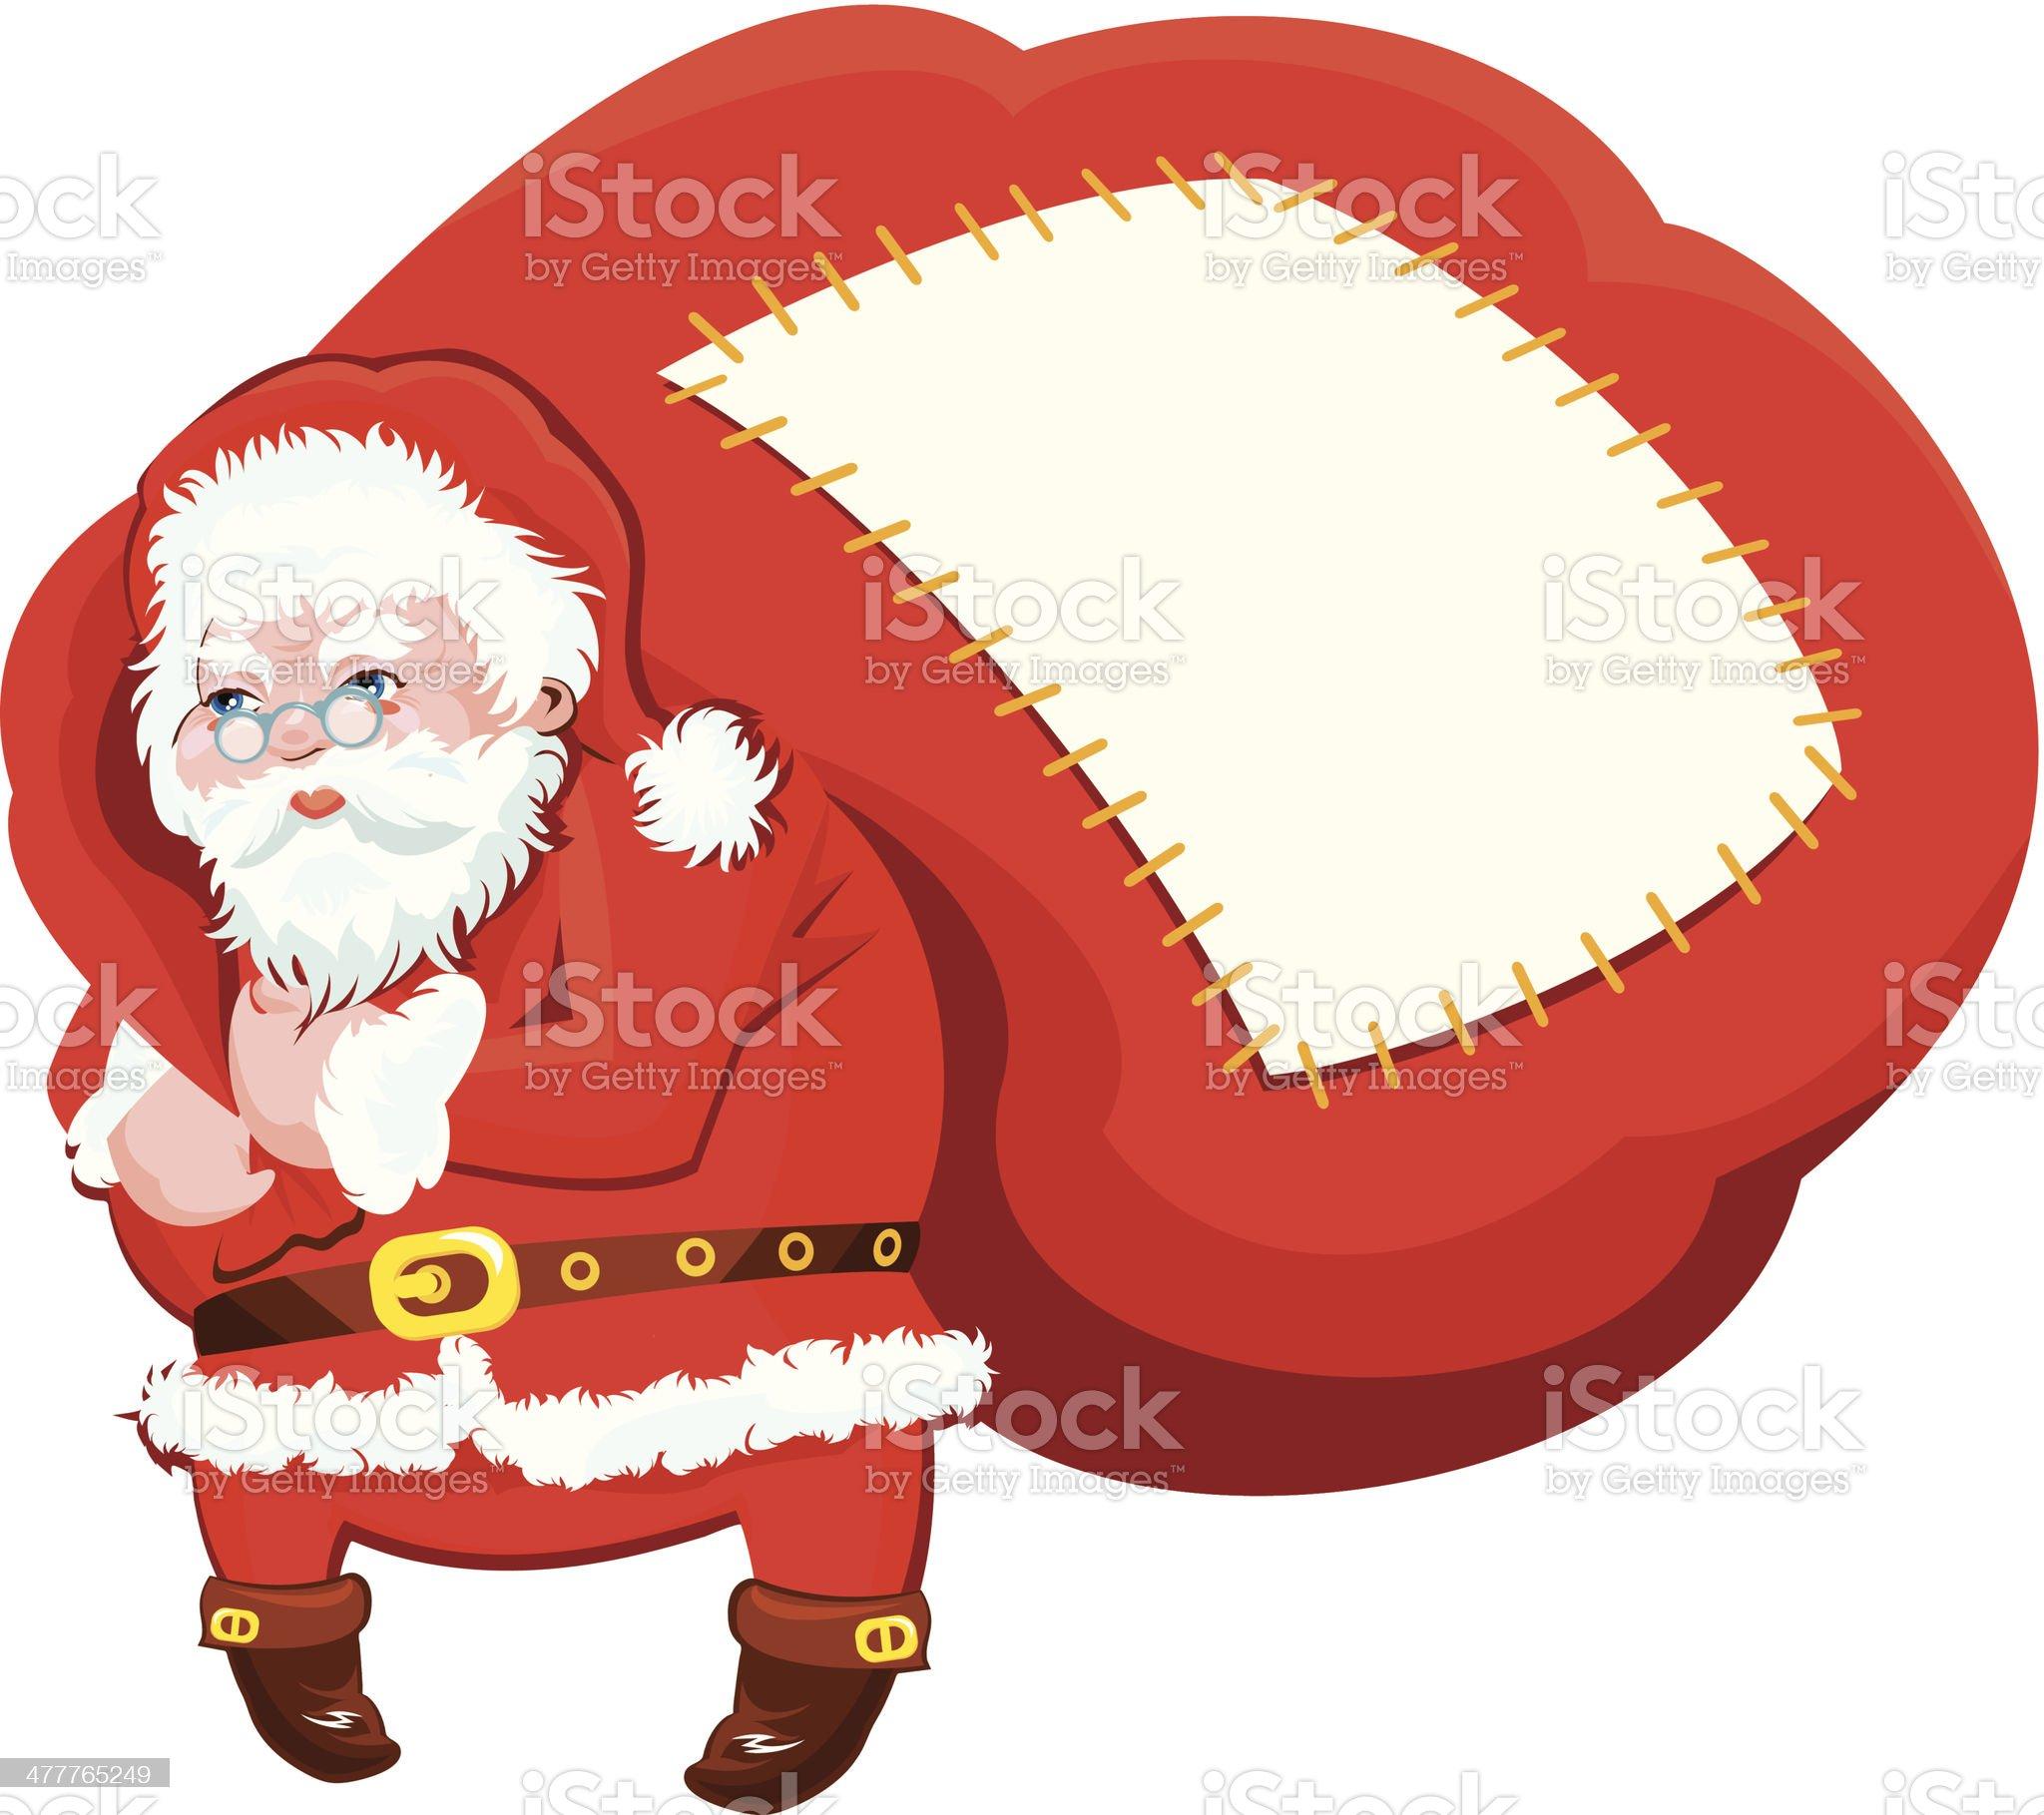 Cartoon Santa Claus with huge sack full of gifts royalty-free stock vector art